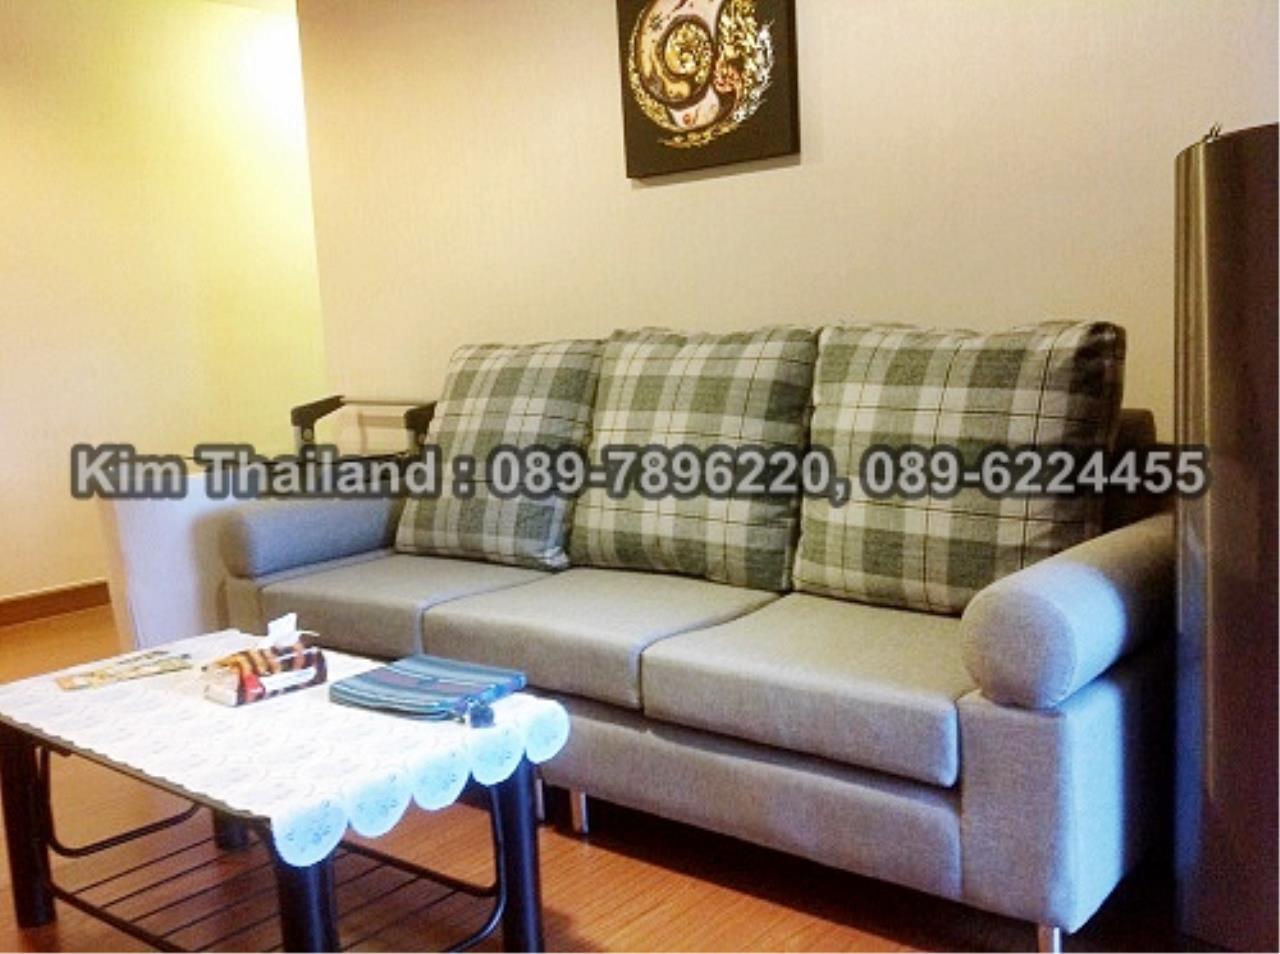 BKKcondorental Agency's For rent, Condo Belle Grand Rama 9.  Building C2, 1Xth floor, Area 48 sq.m.  1